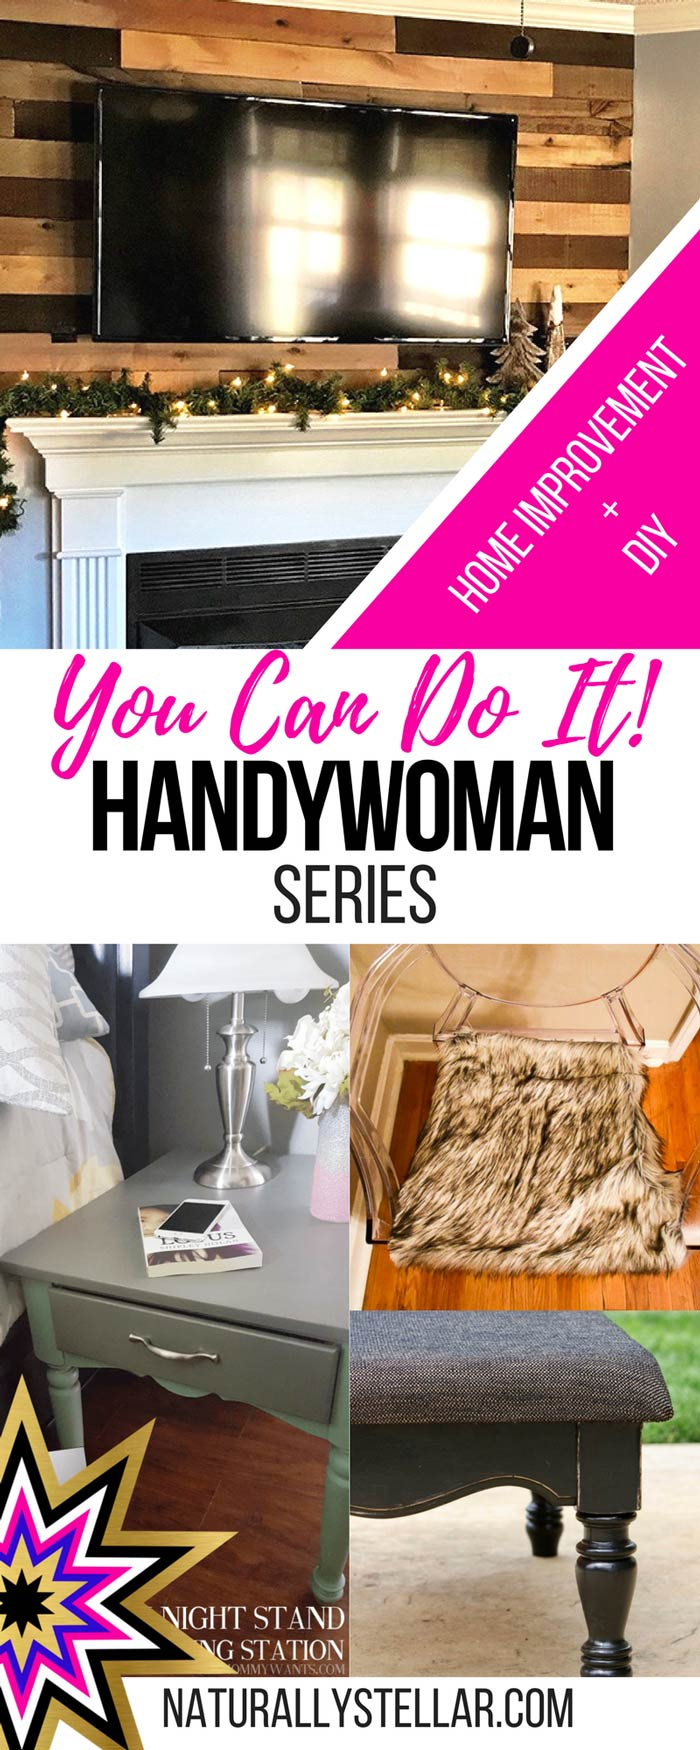 You Can Do It Handywoman Series | Naturally Stellar